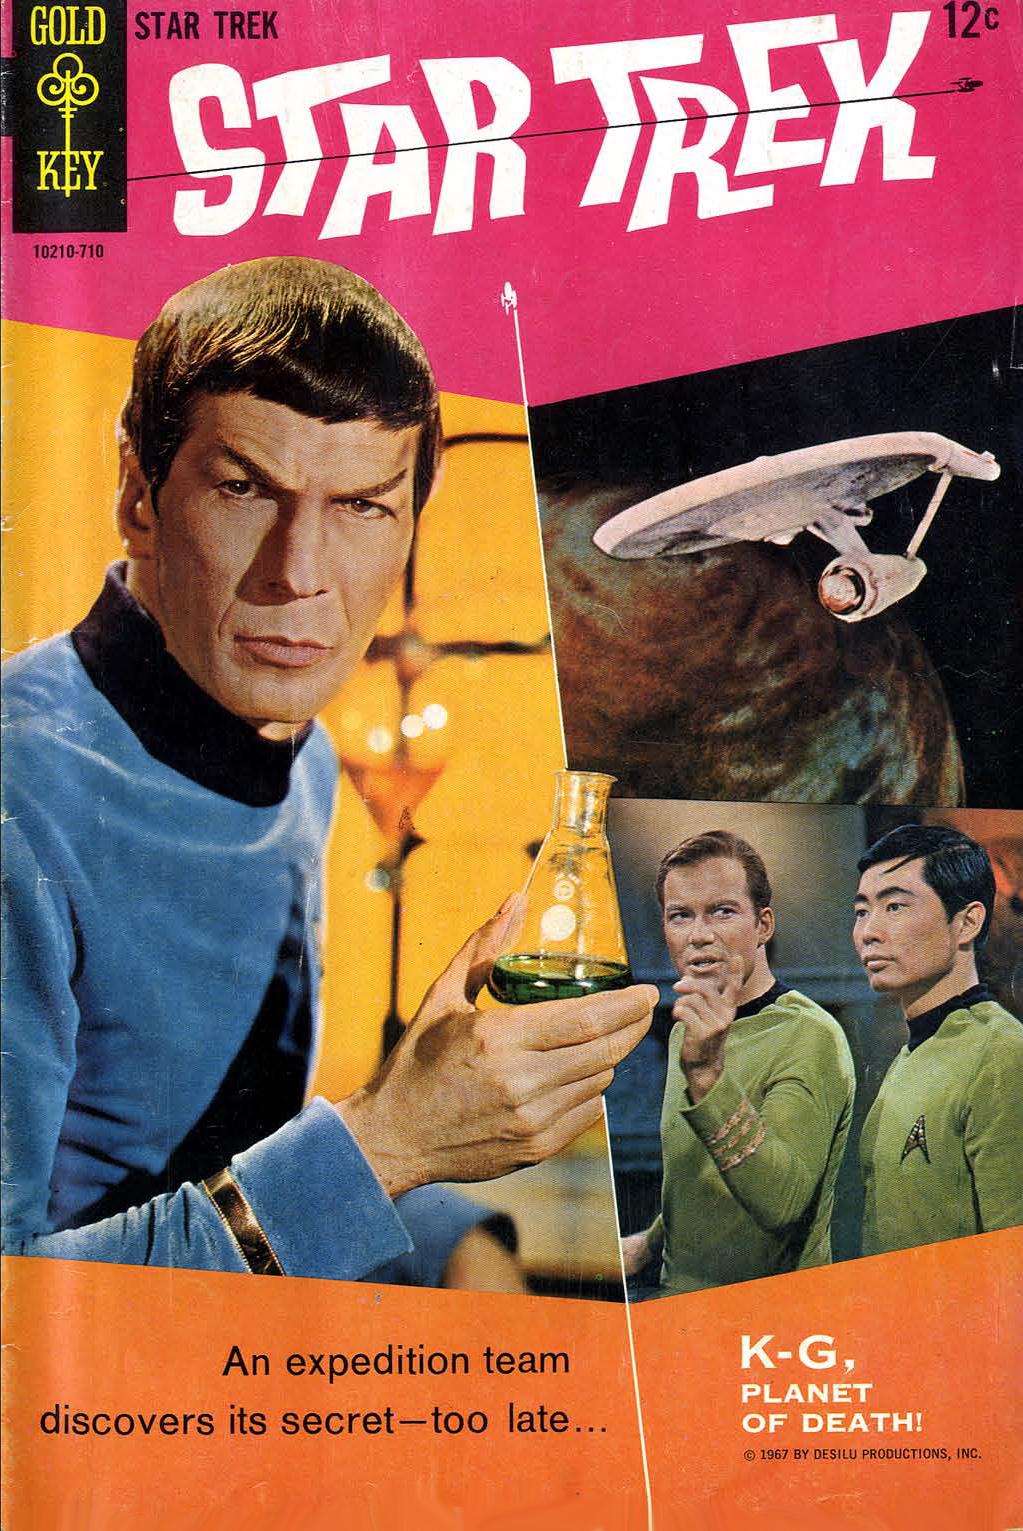 Star-Trek-Gold-Key-1